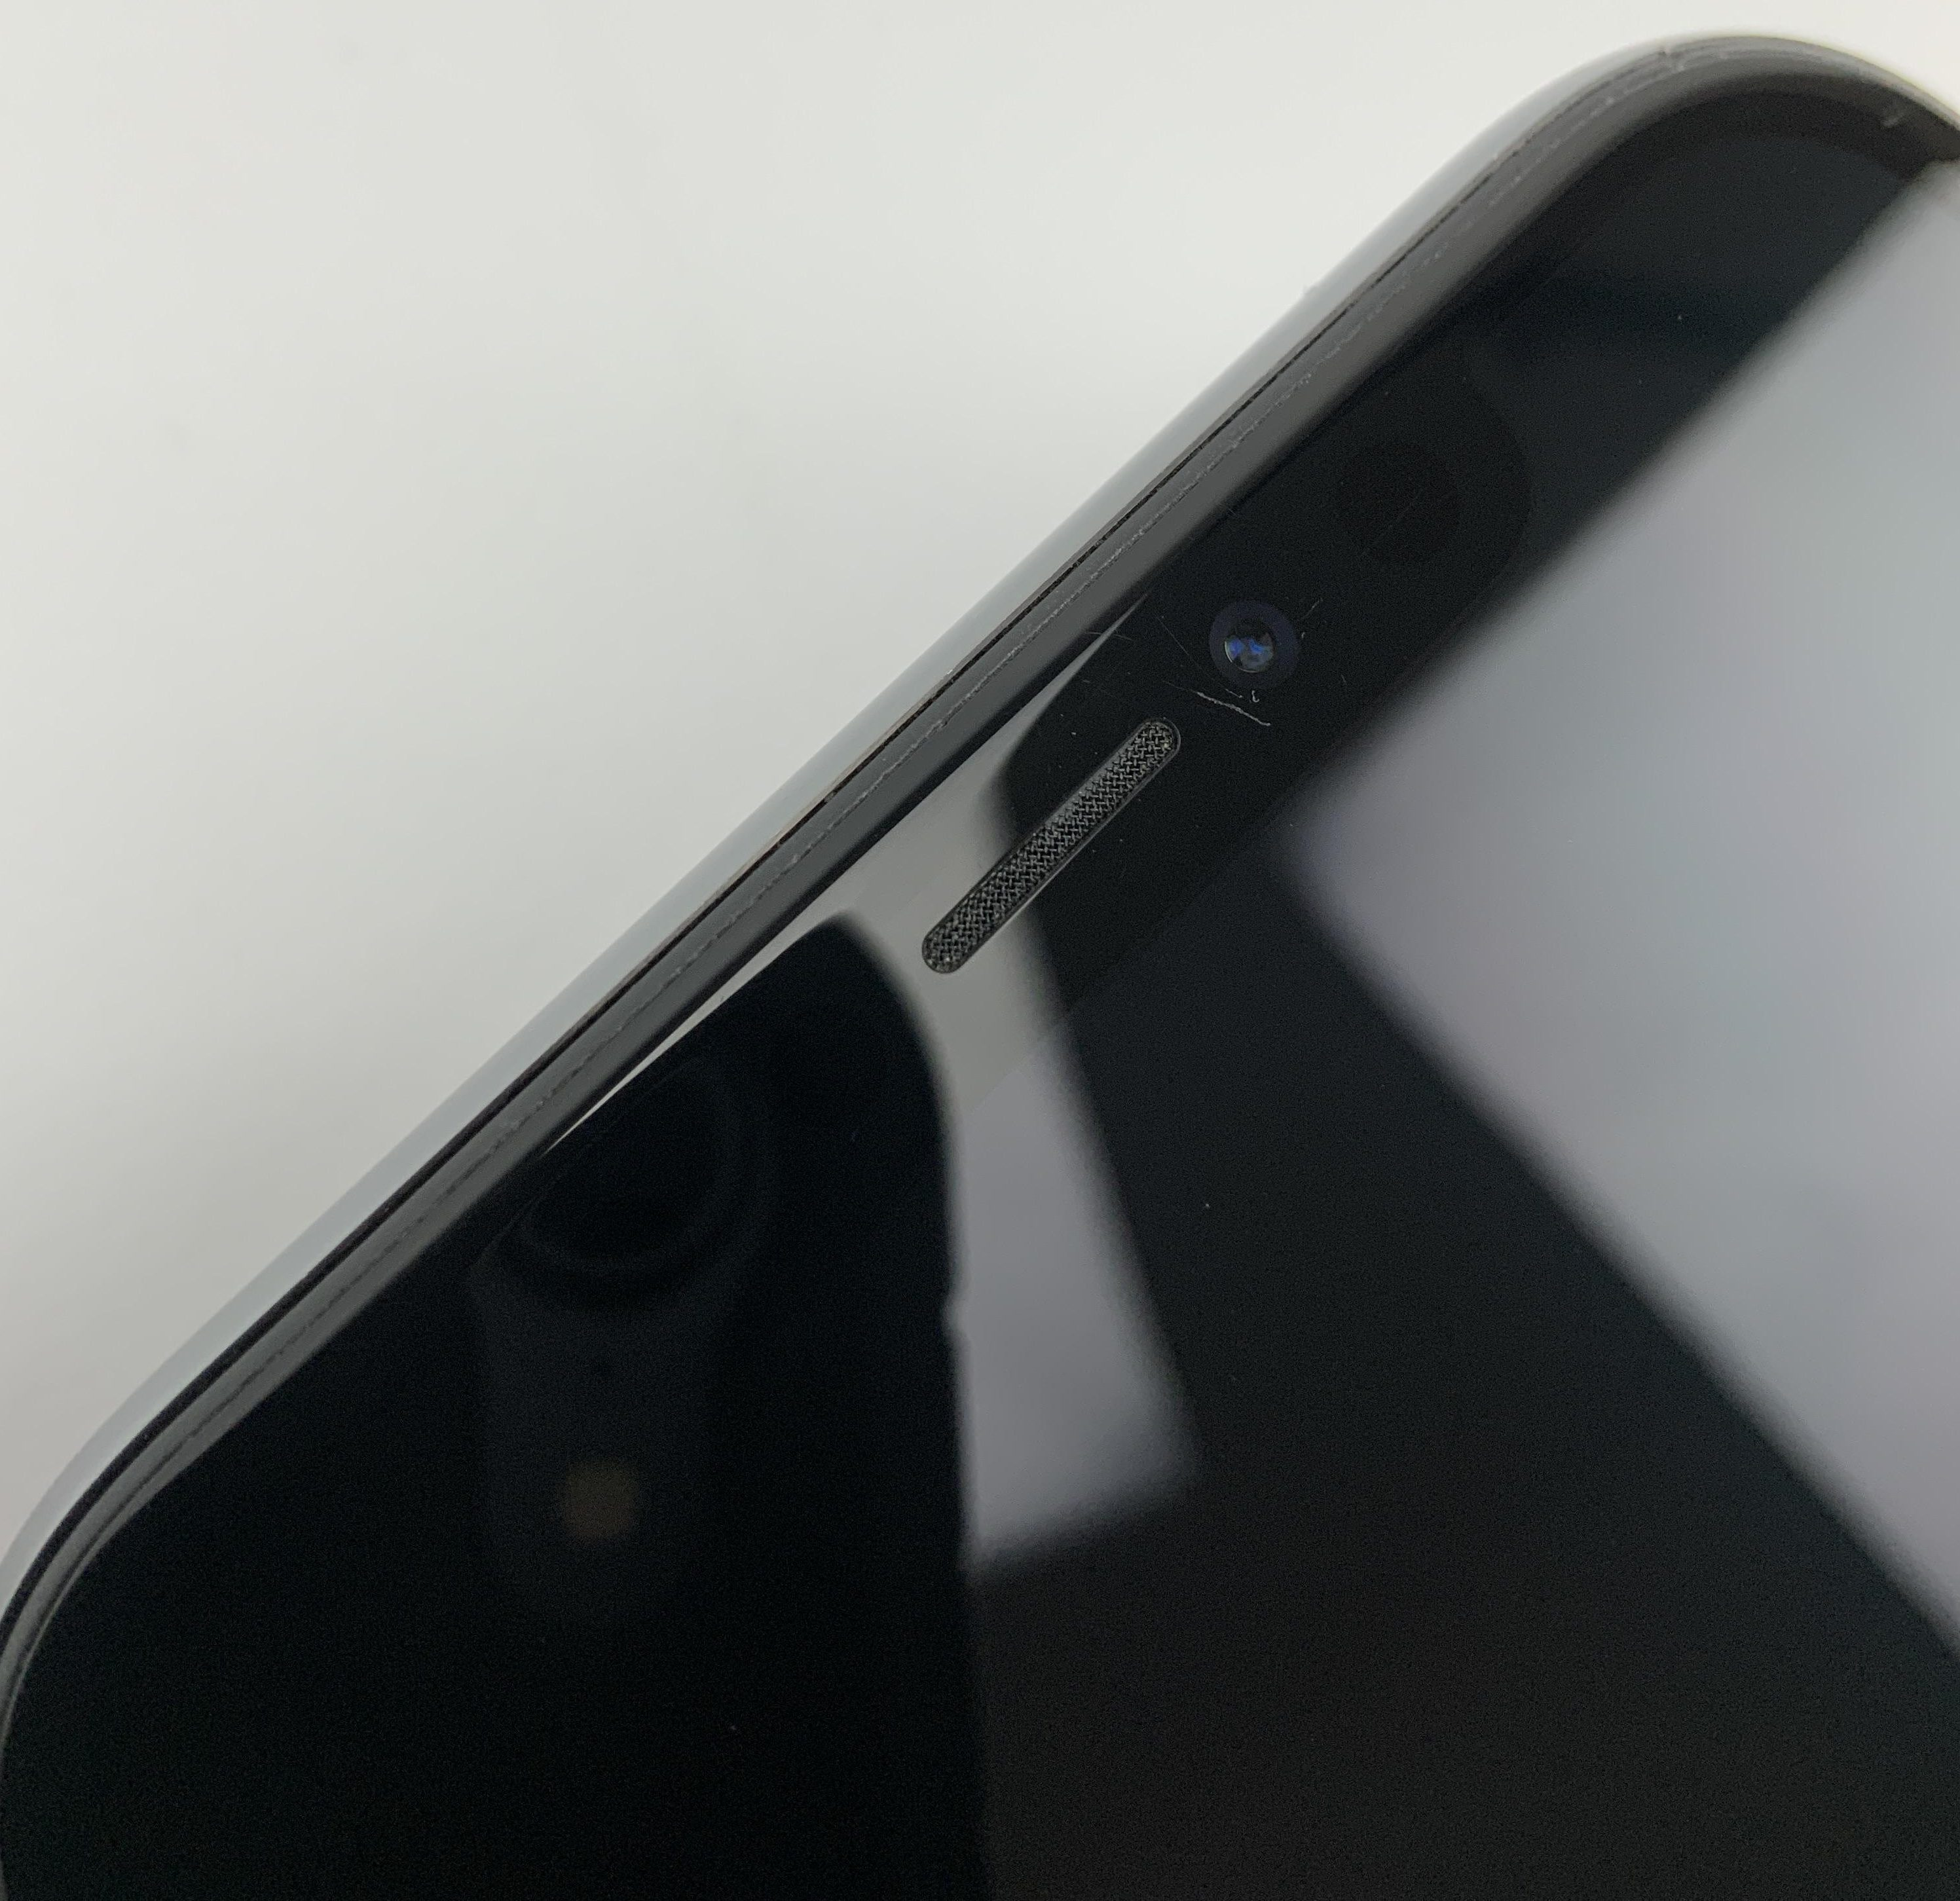 iPhone X 64GB, 64GB, Space Gray, imagen 3